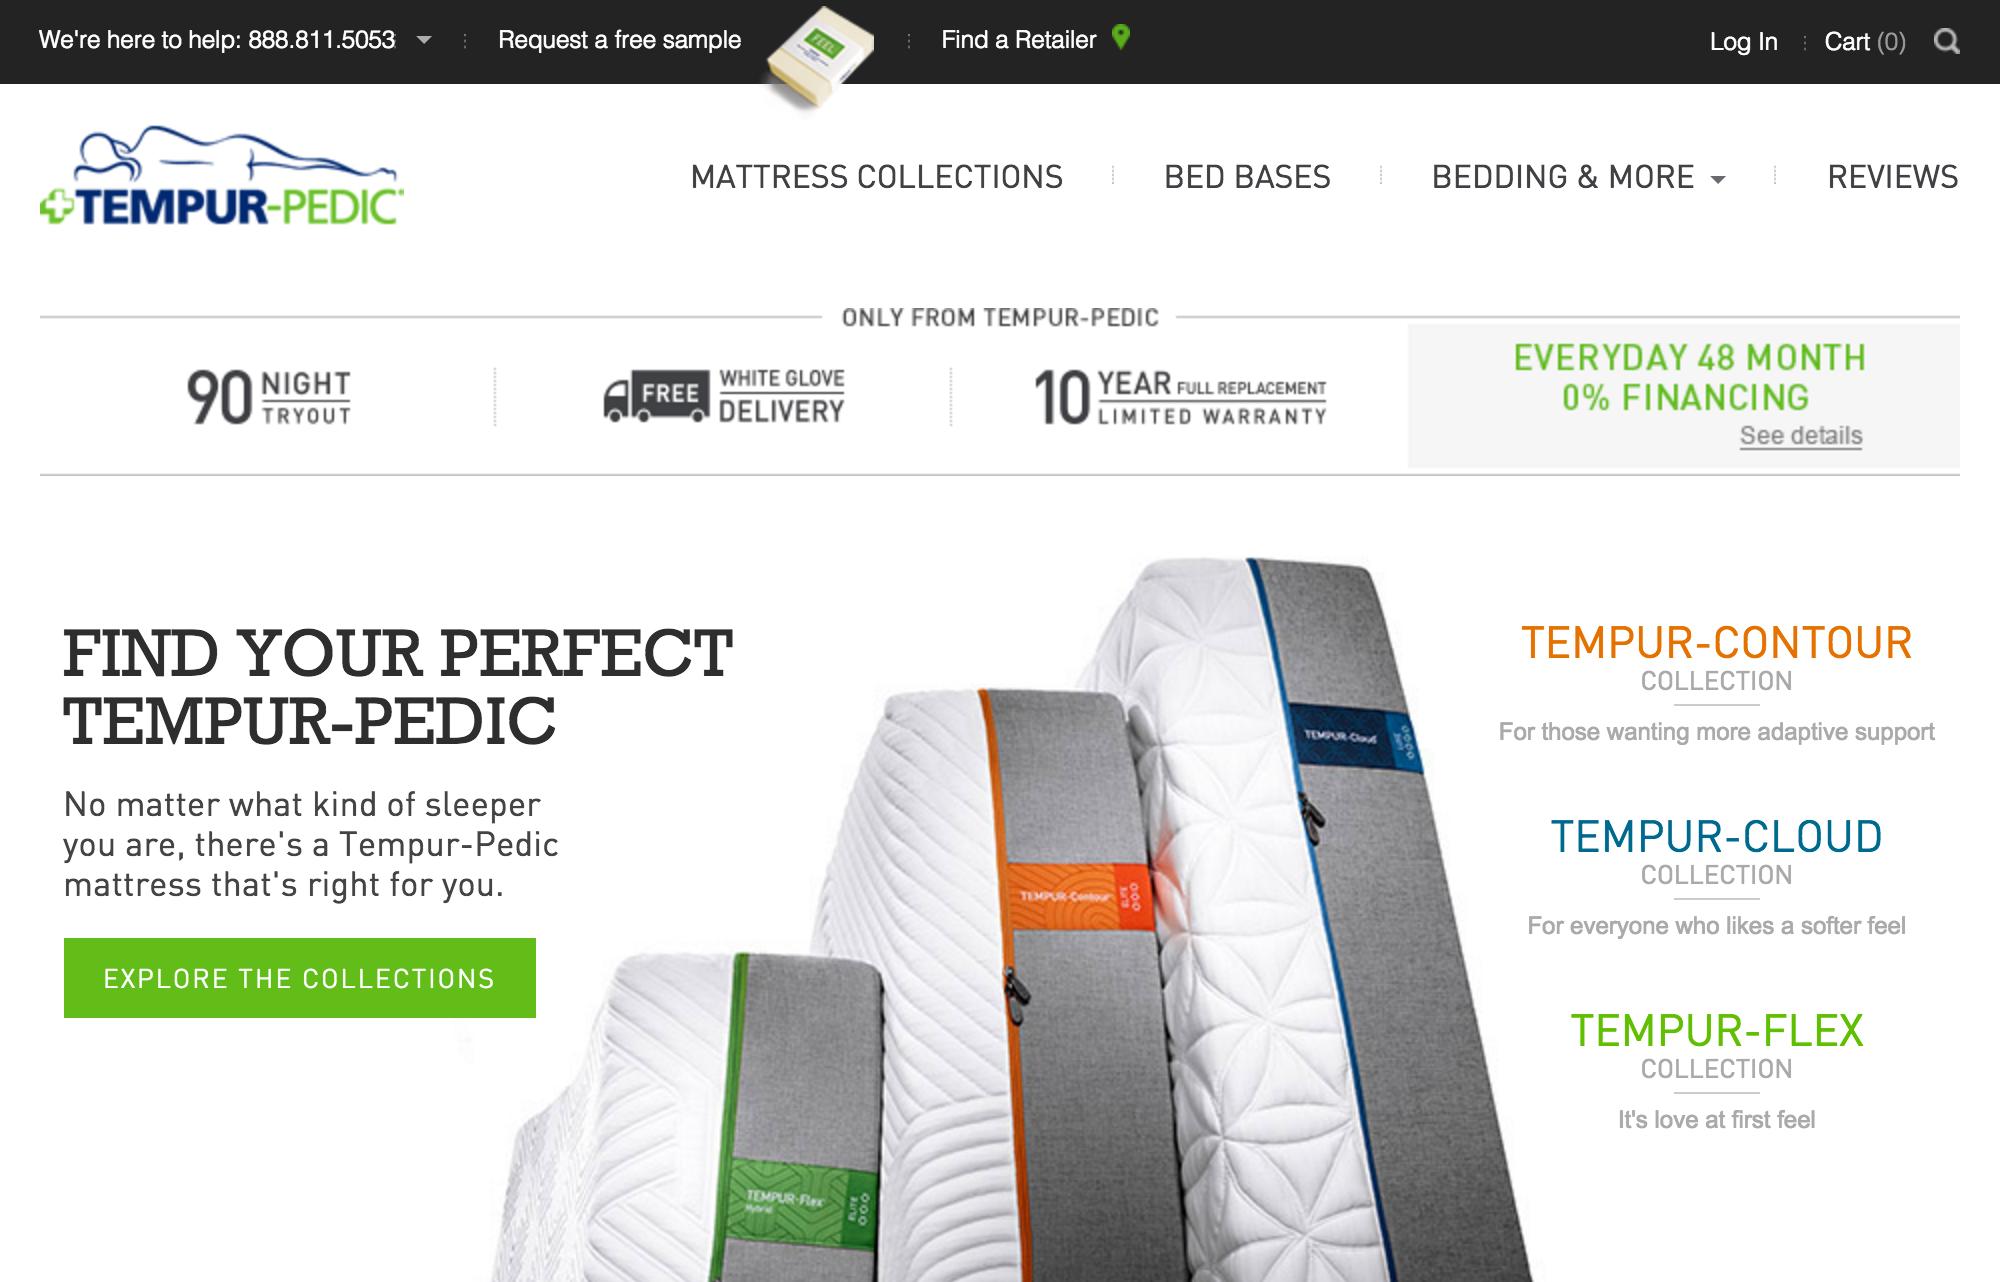 Top 34 Complaints and Reviews about Tempur-Pedic Adjustable Beds